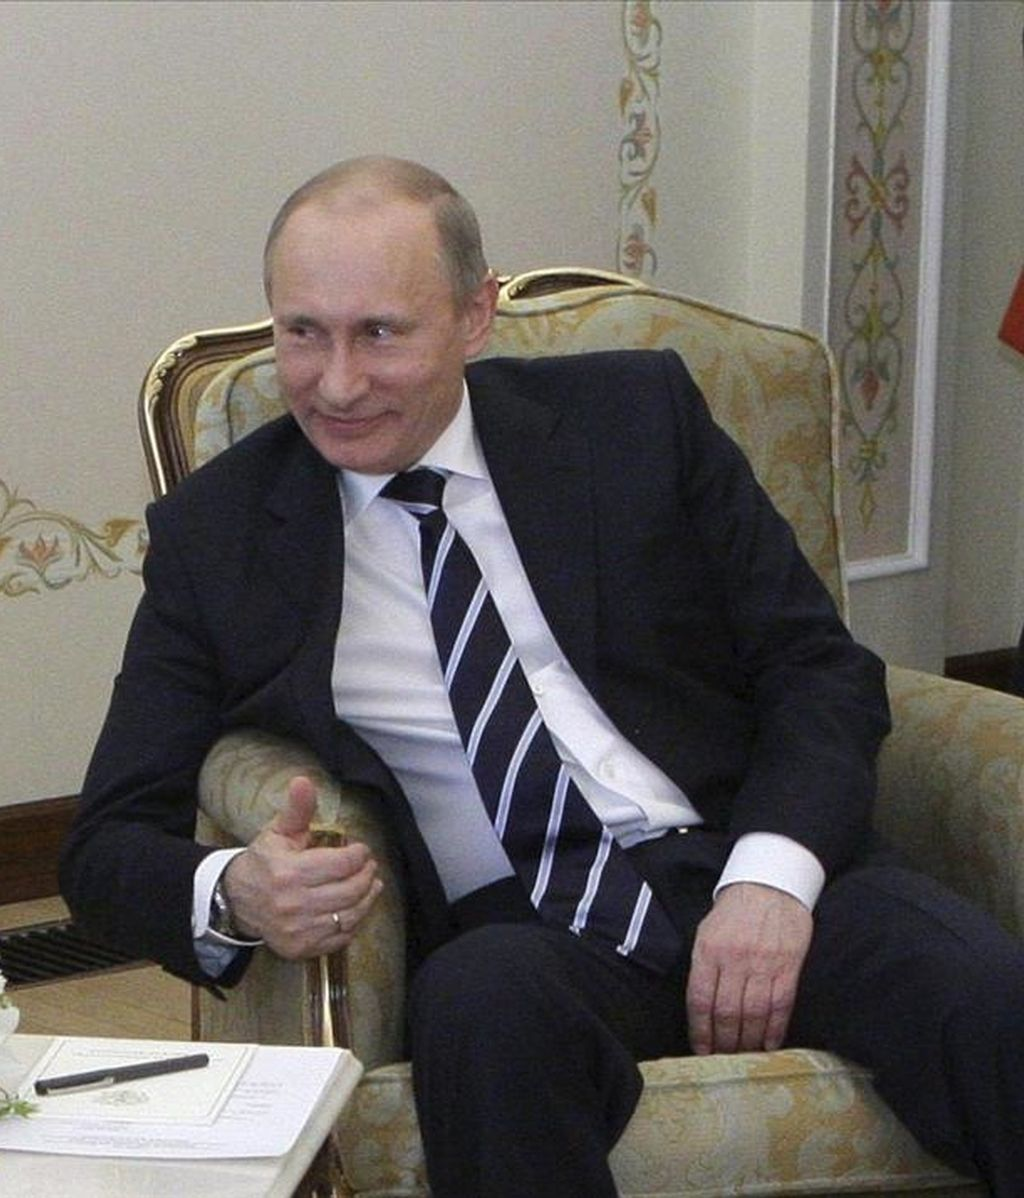 El primer ministro ruso Vladimir Putin. EFE/Archivo